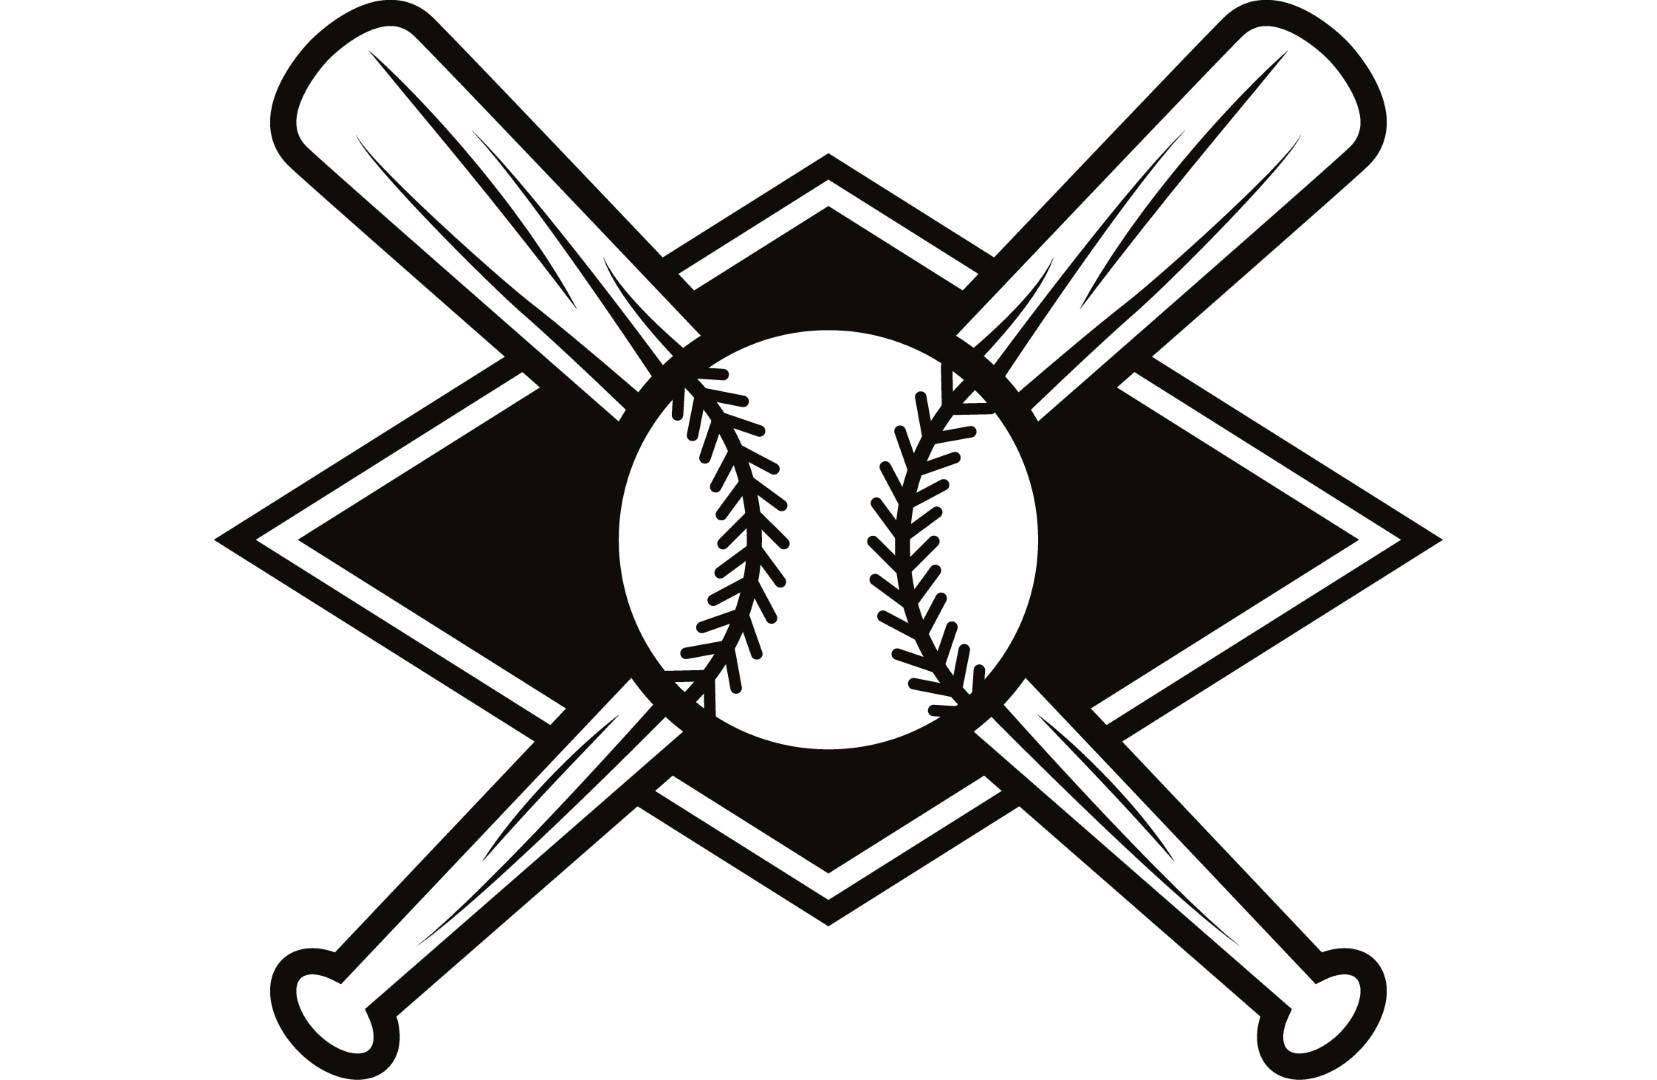 Baseball Logo 7 Bats Crossed Ball Diamond League Equipment ...